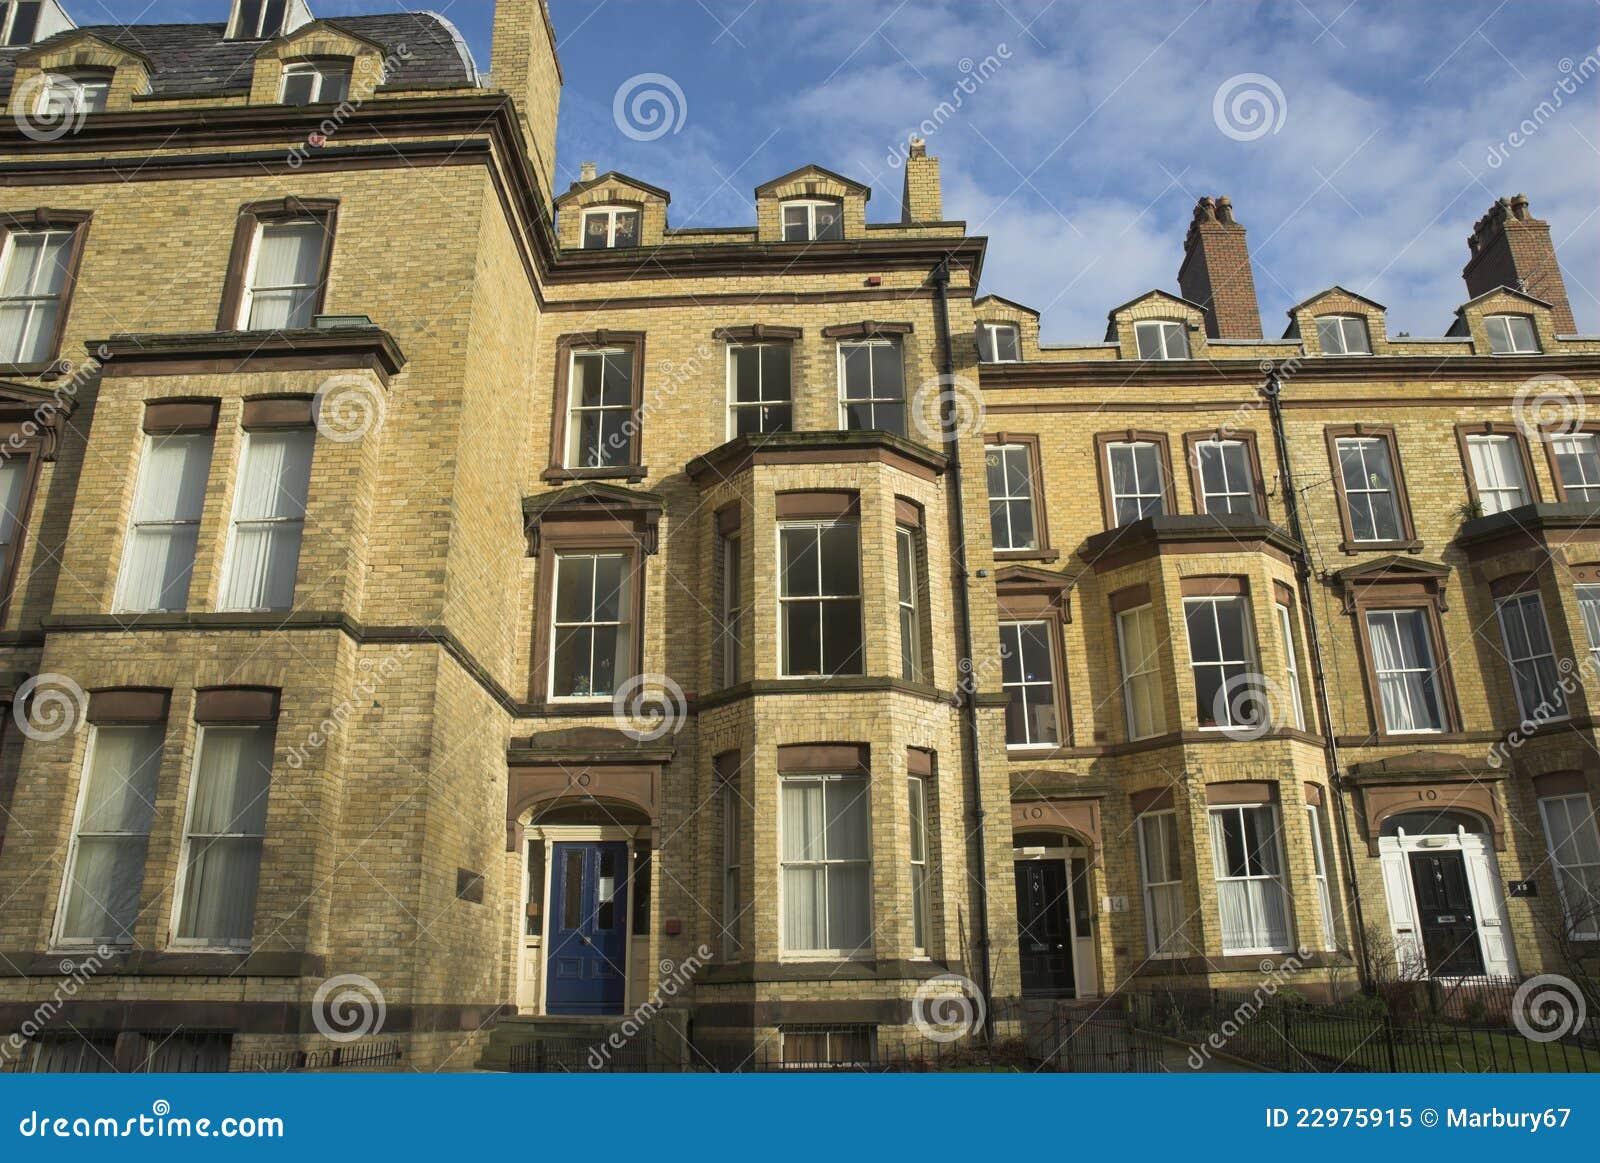 Download Yellow Brick Houses stock image. Image of houses, yellow - 22975915